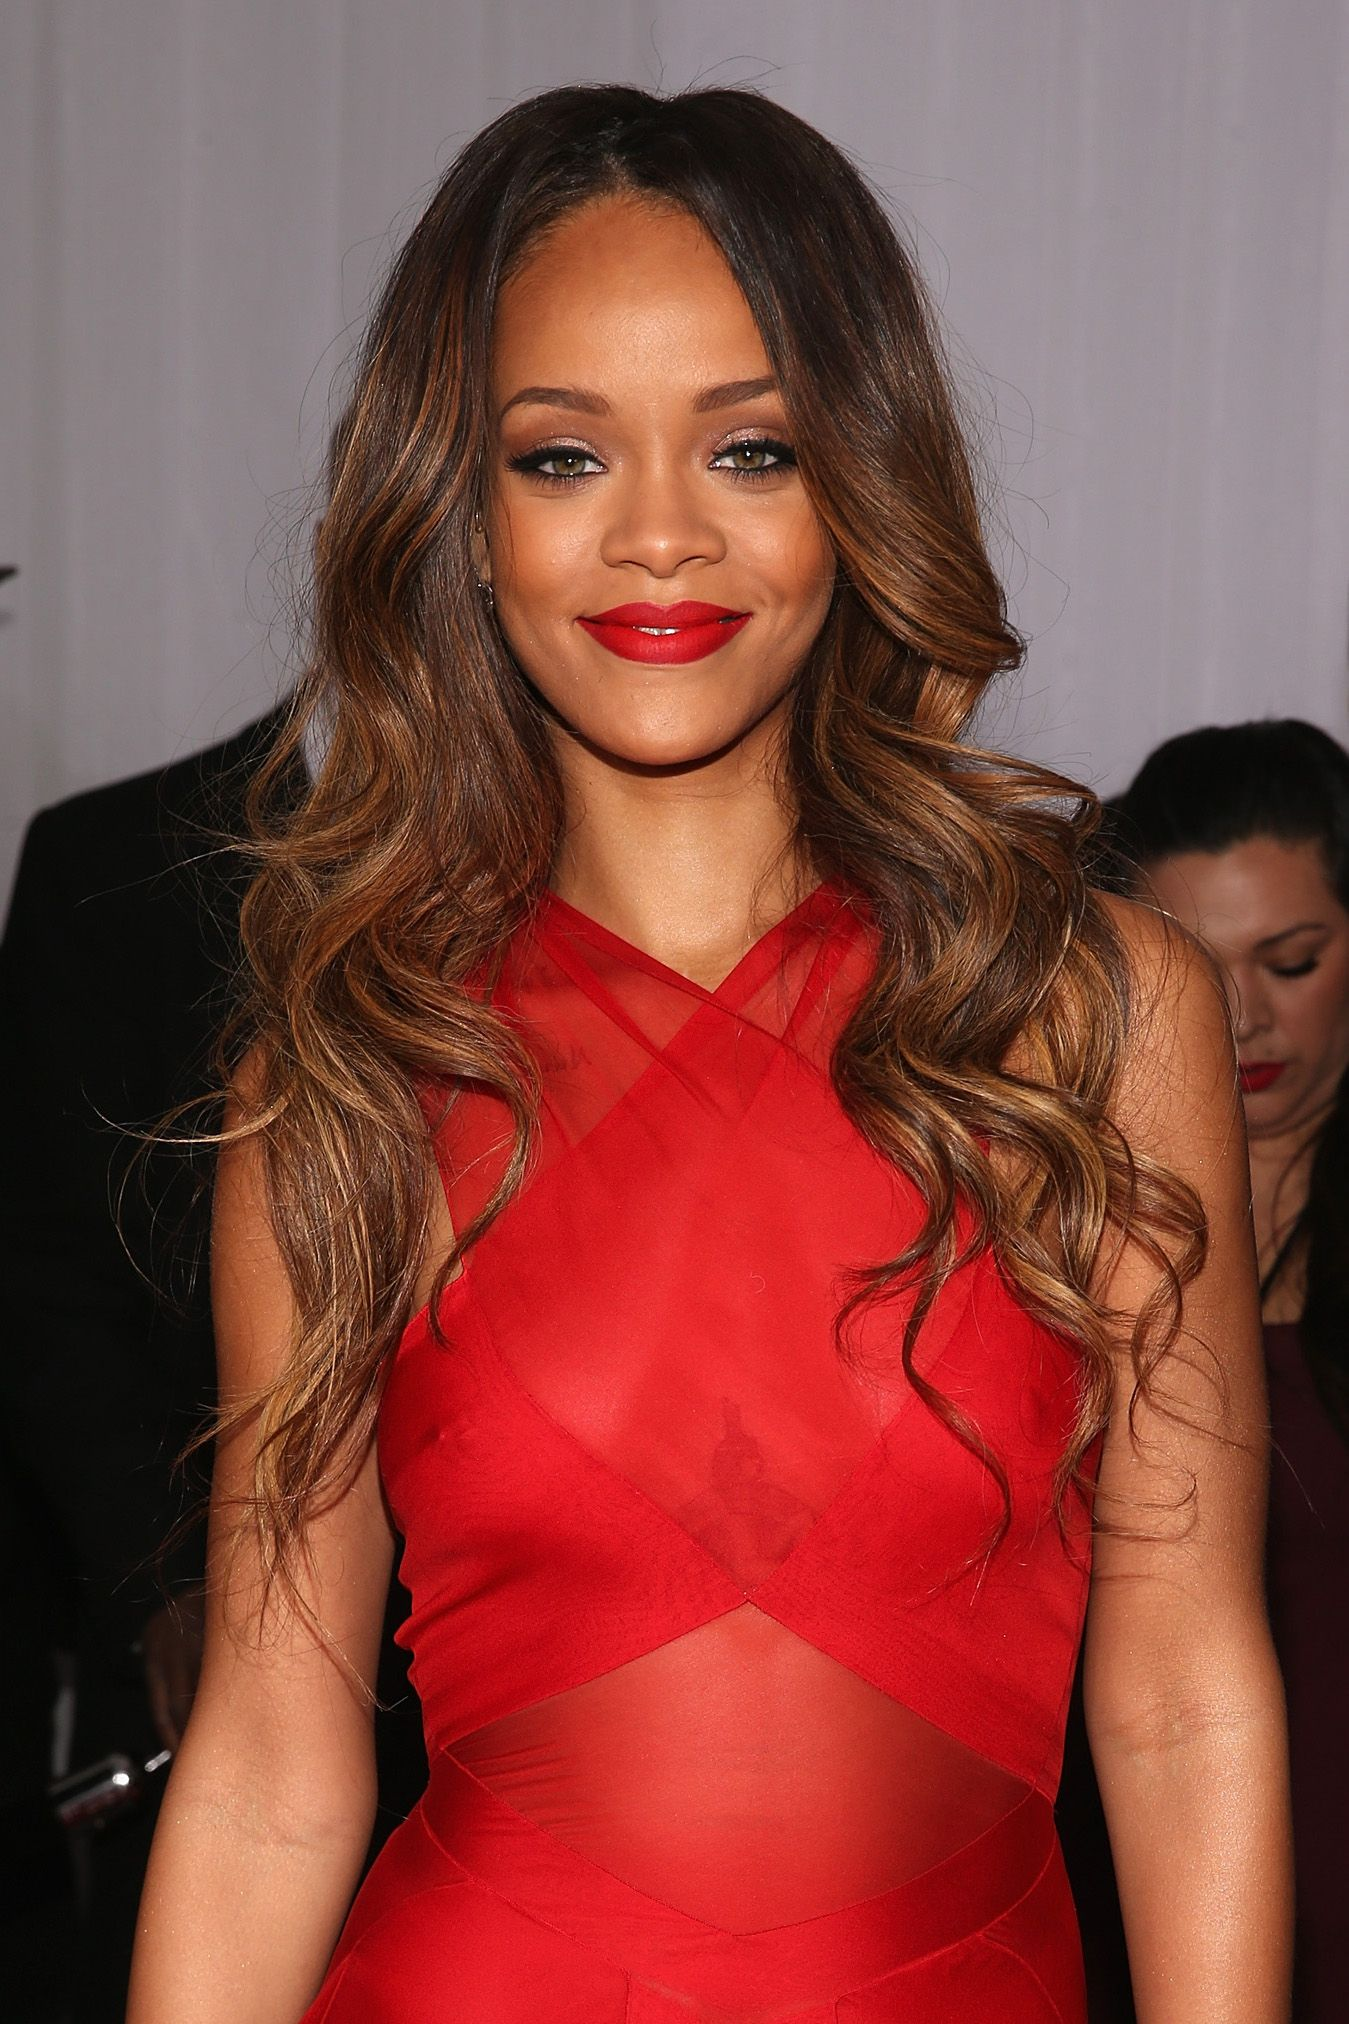 Rihanna hairstyles 2016 2017 women hairstyles